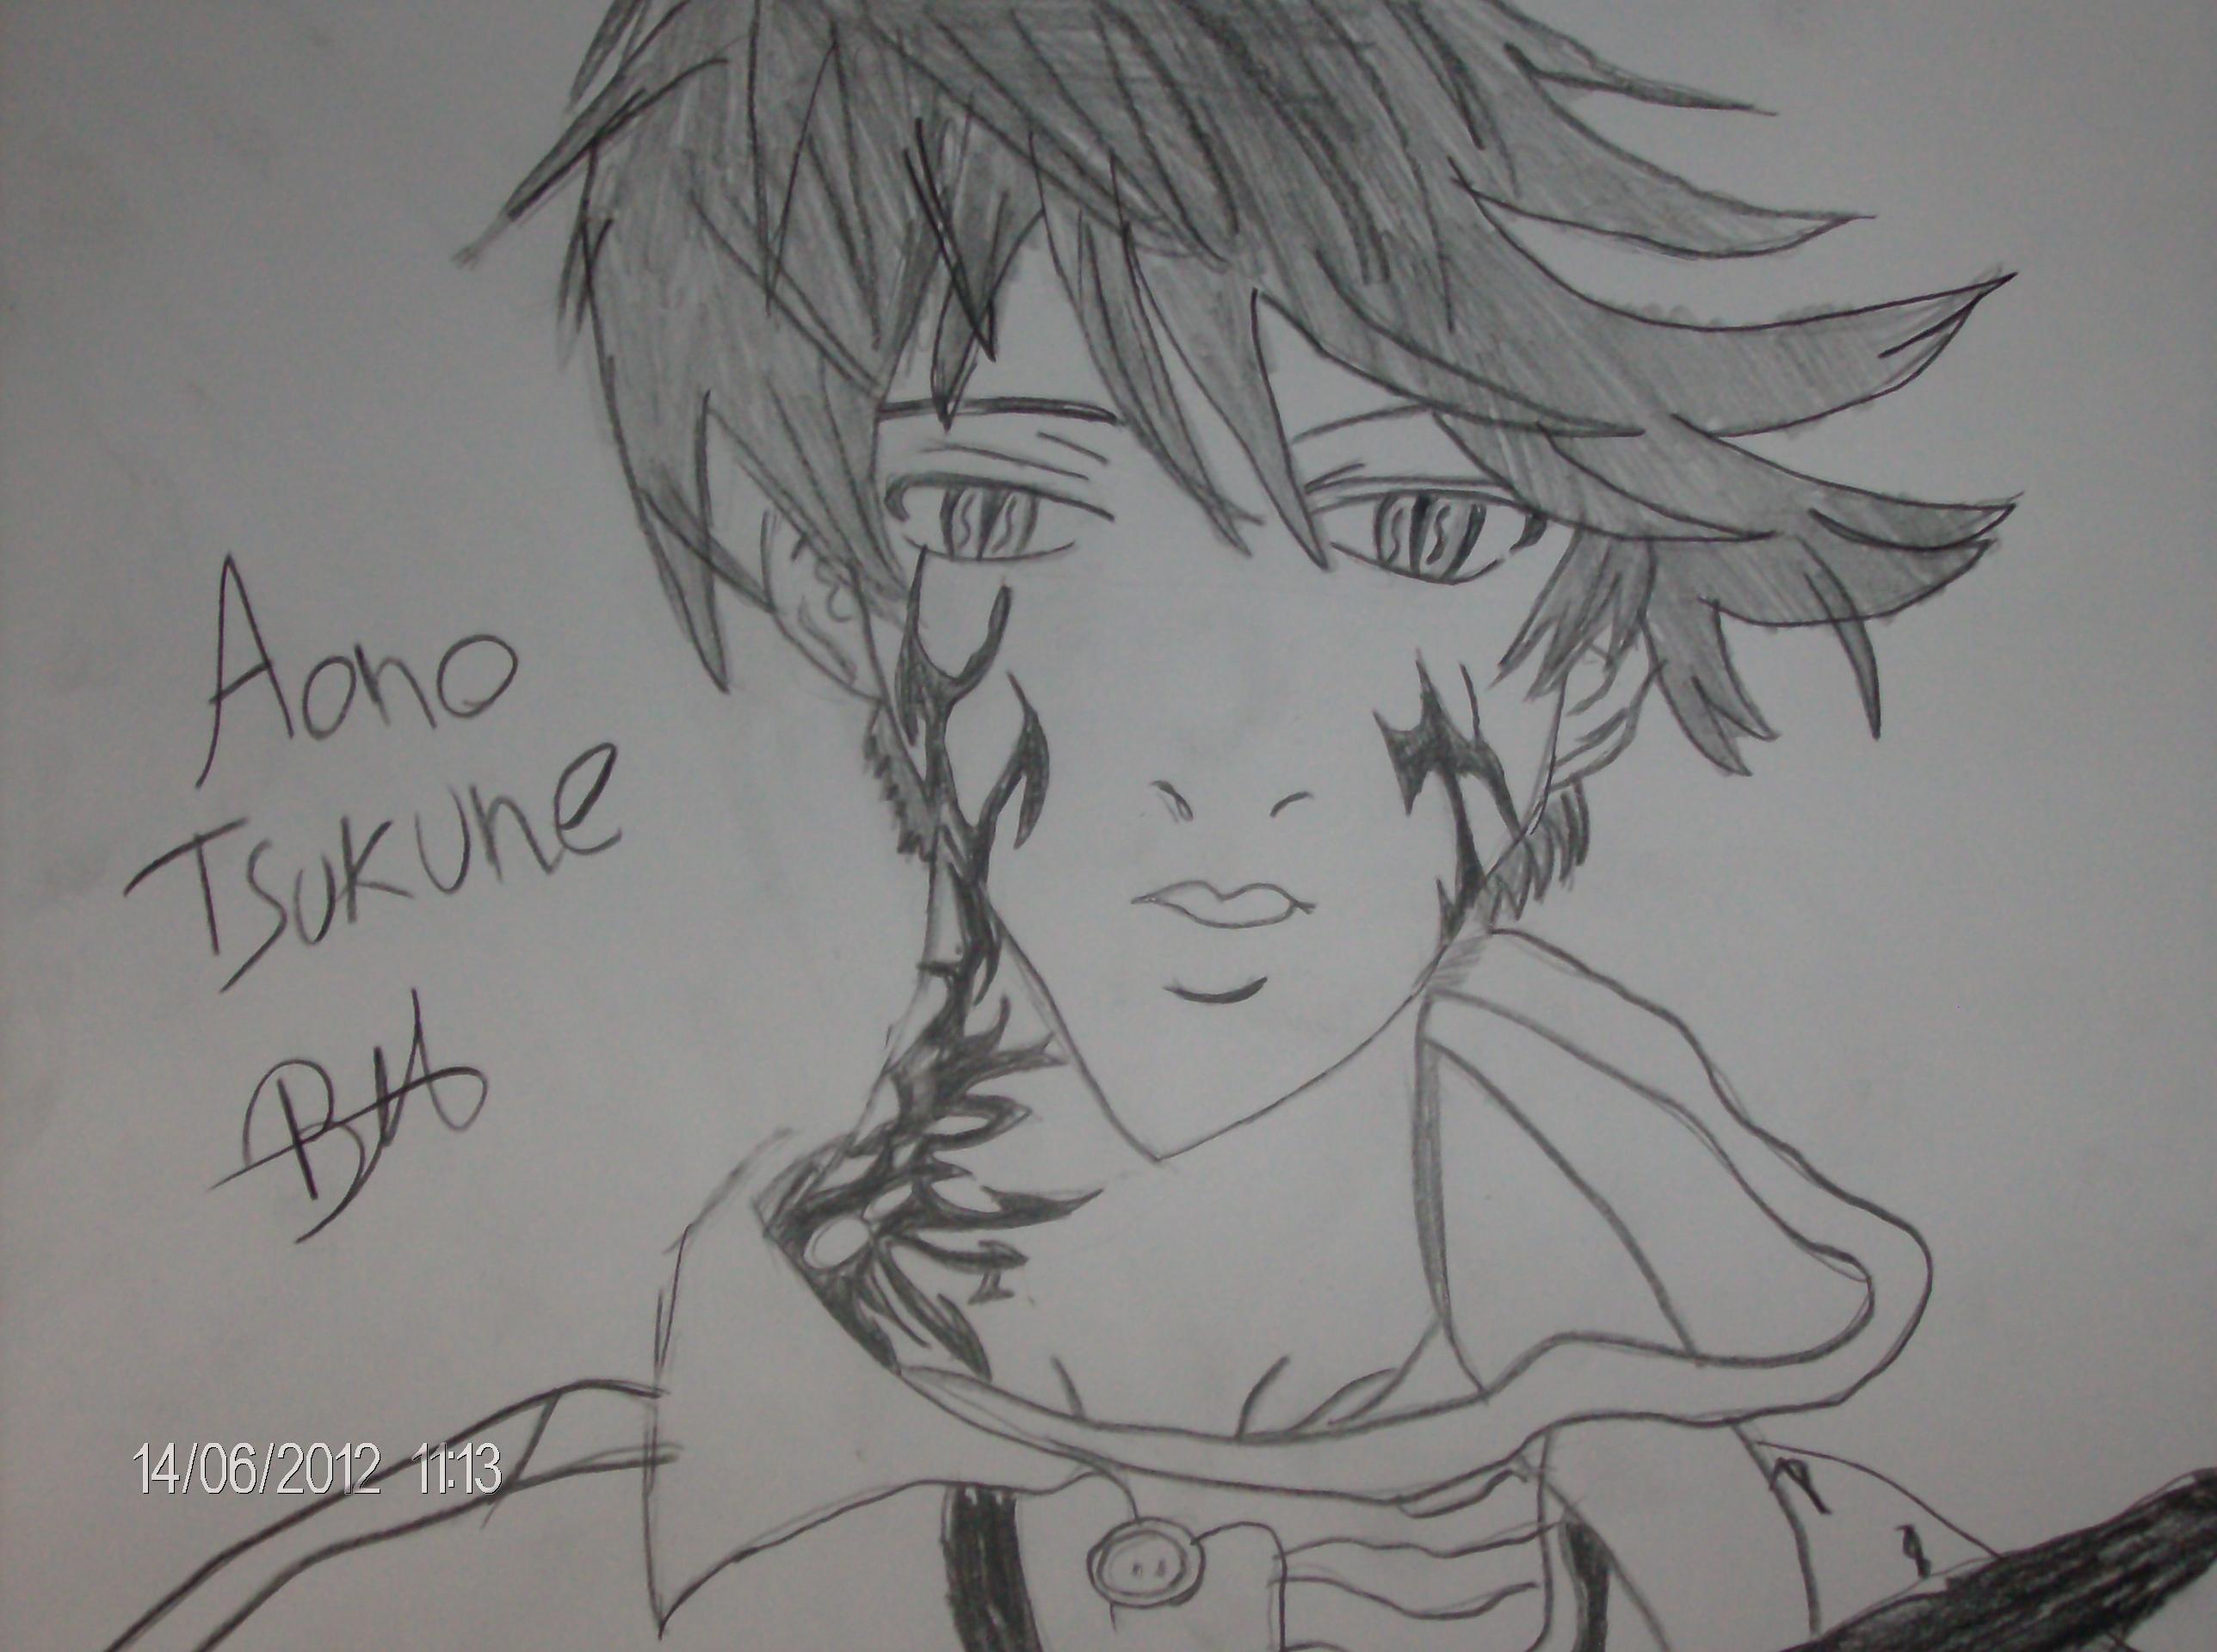 Tsukune Aono  Rosario  Vampire Wiki  FANDOM powered by